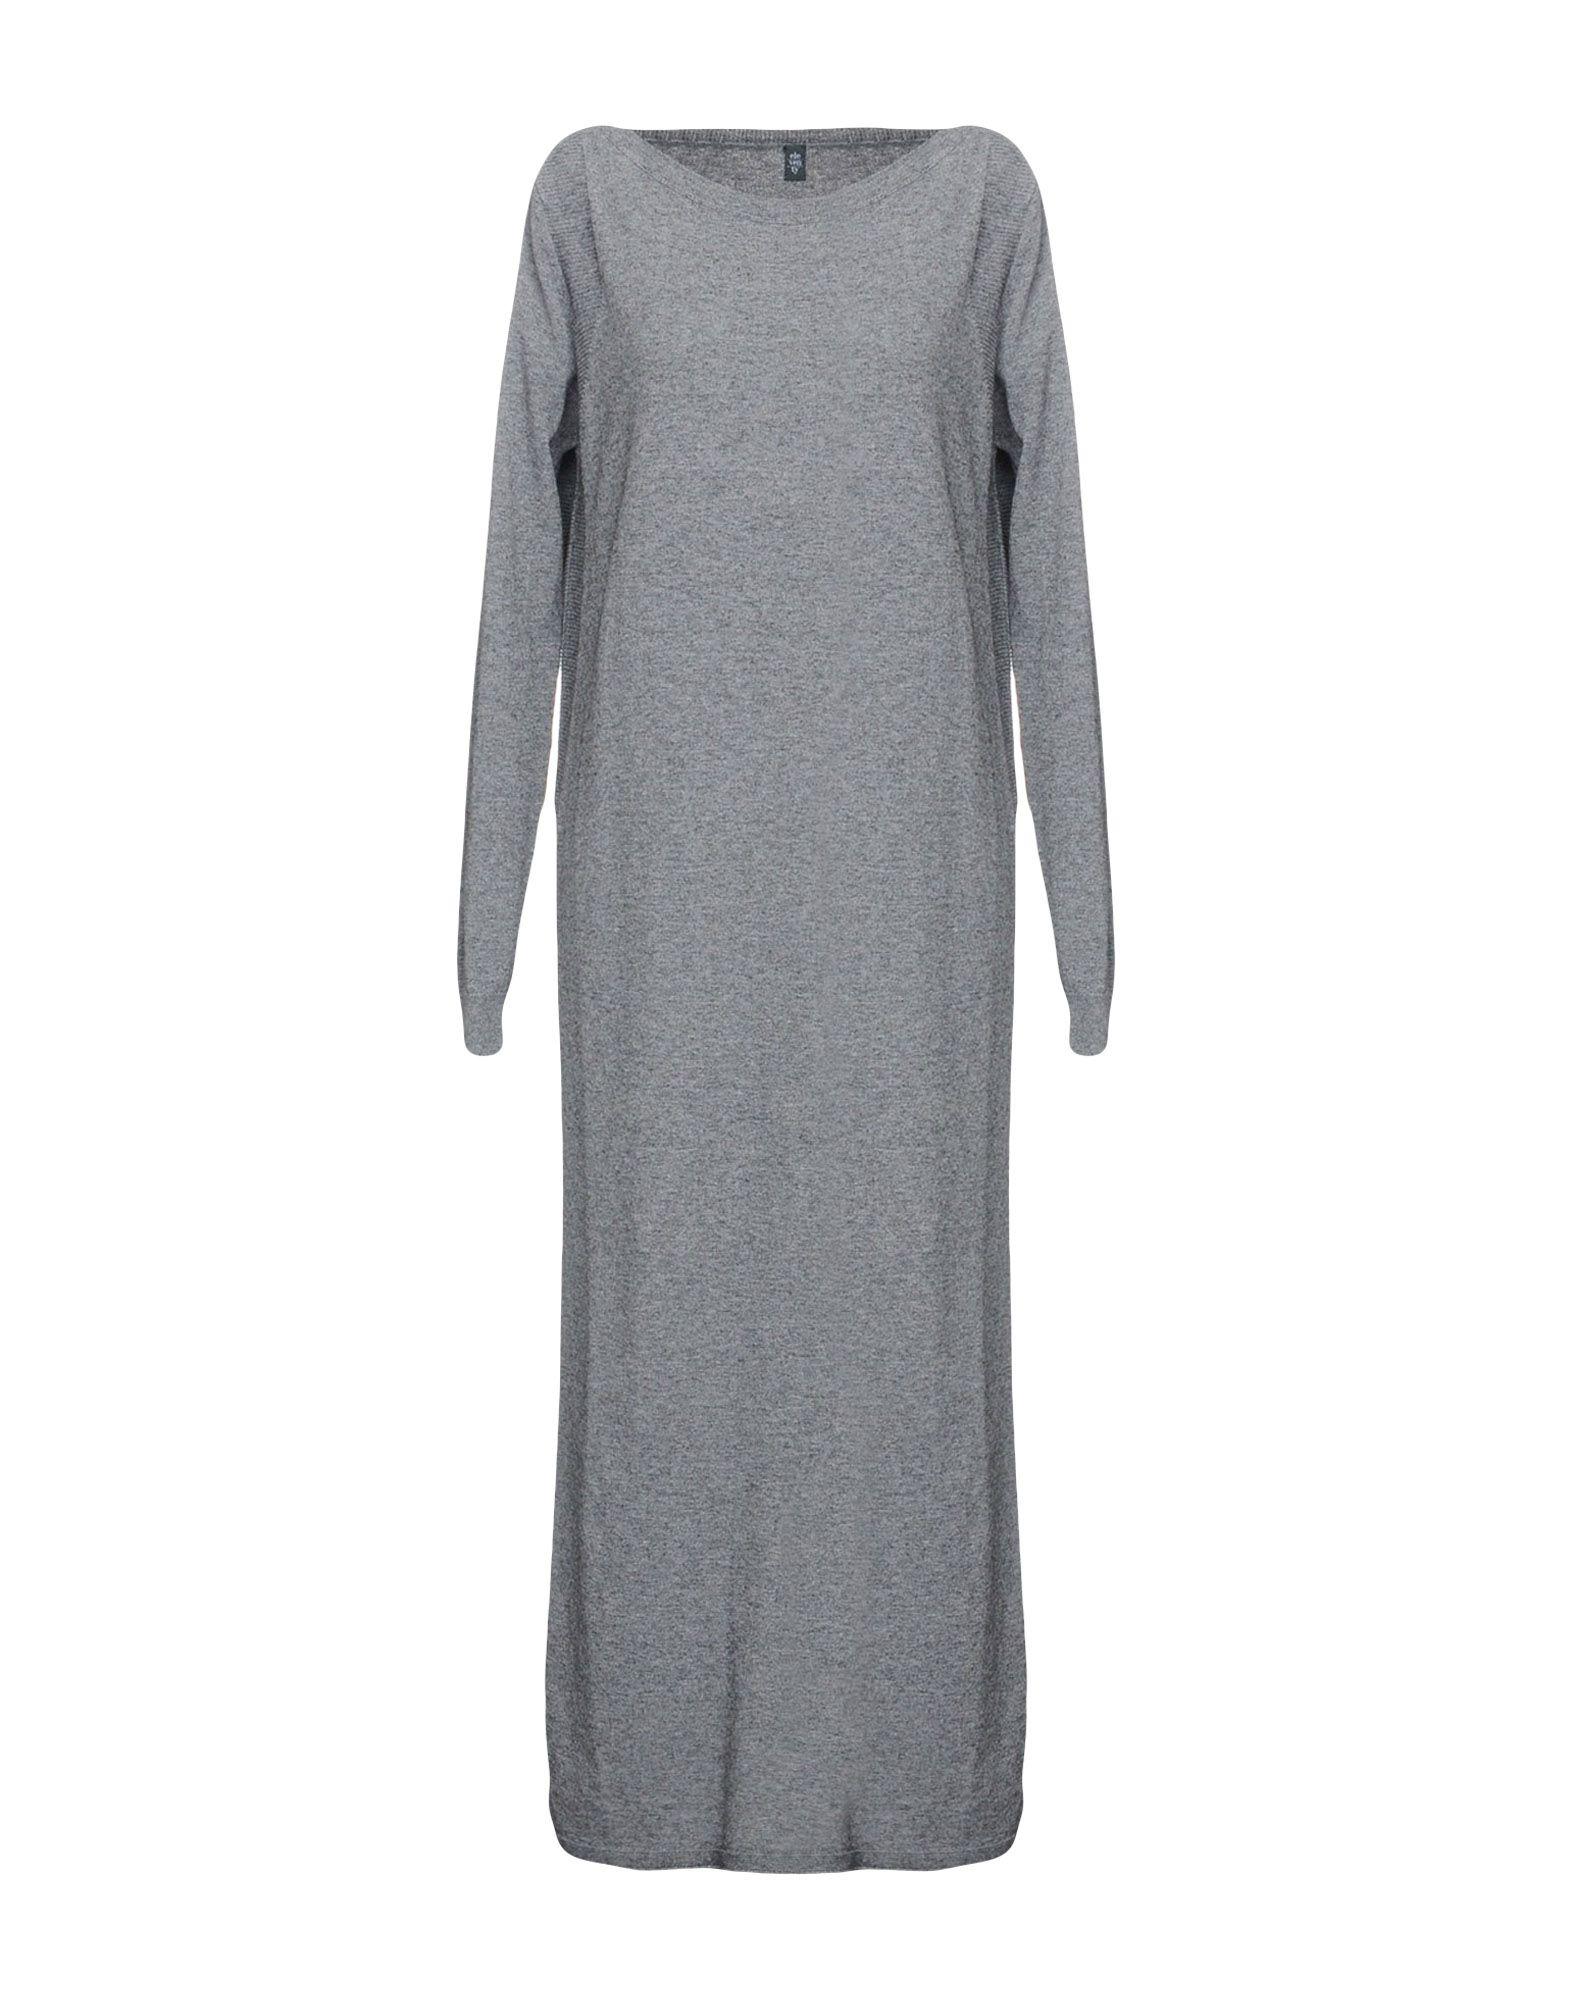 ELEVENTY Платье длиной 3/4 nardi pvl 4 lt 33 x